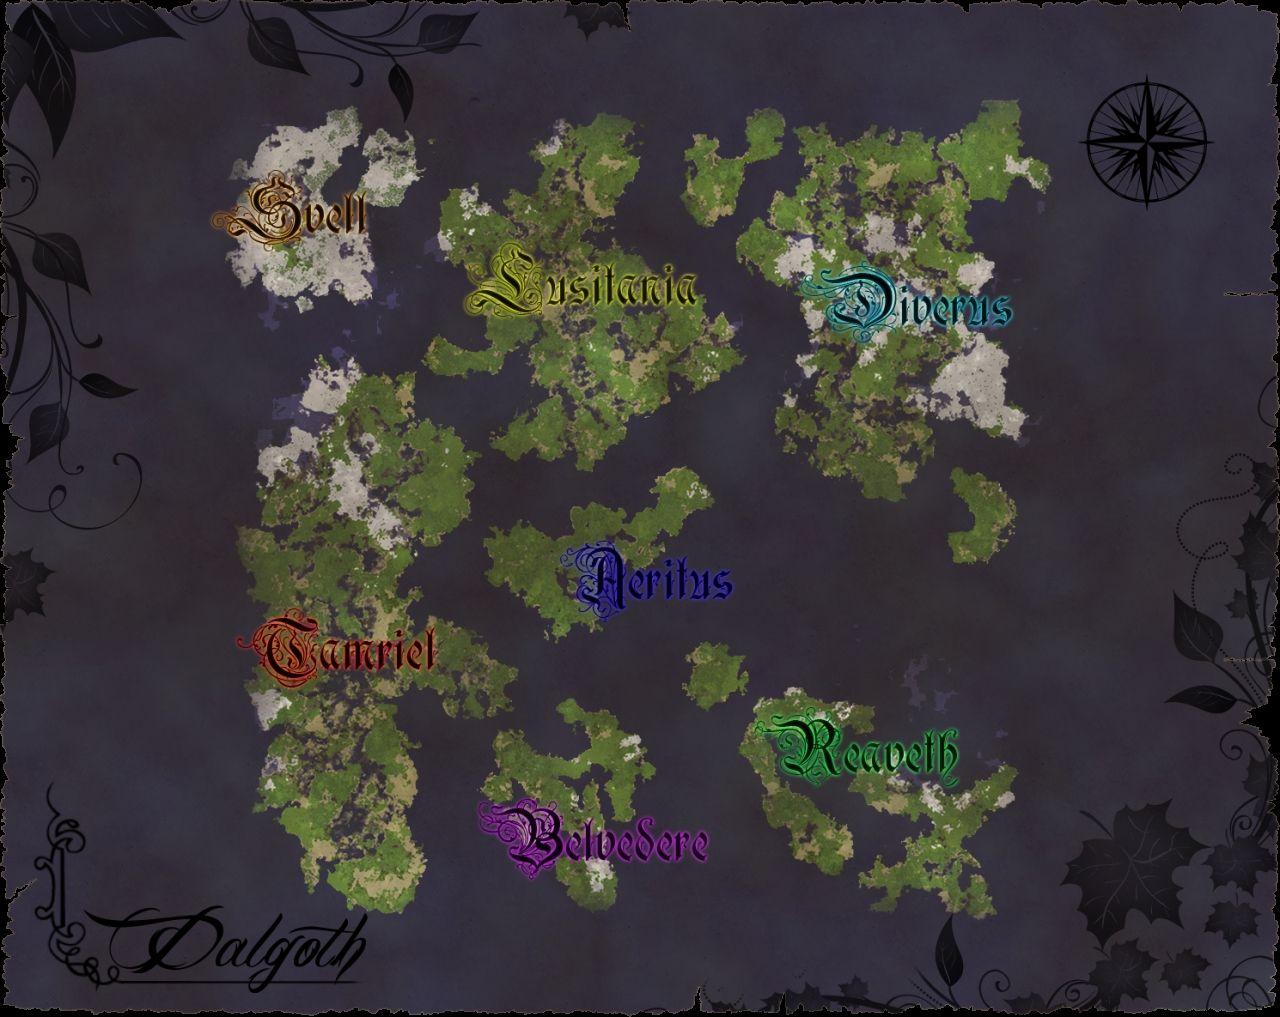 https://img.9minecraft.net/Map/Castle-Lividus-of-Aeritus-Map-1.jpg